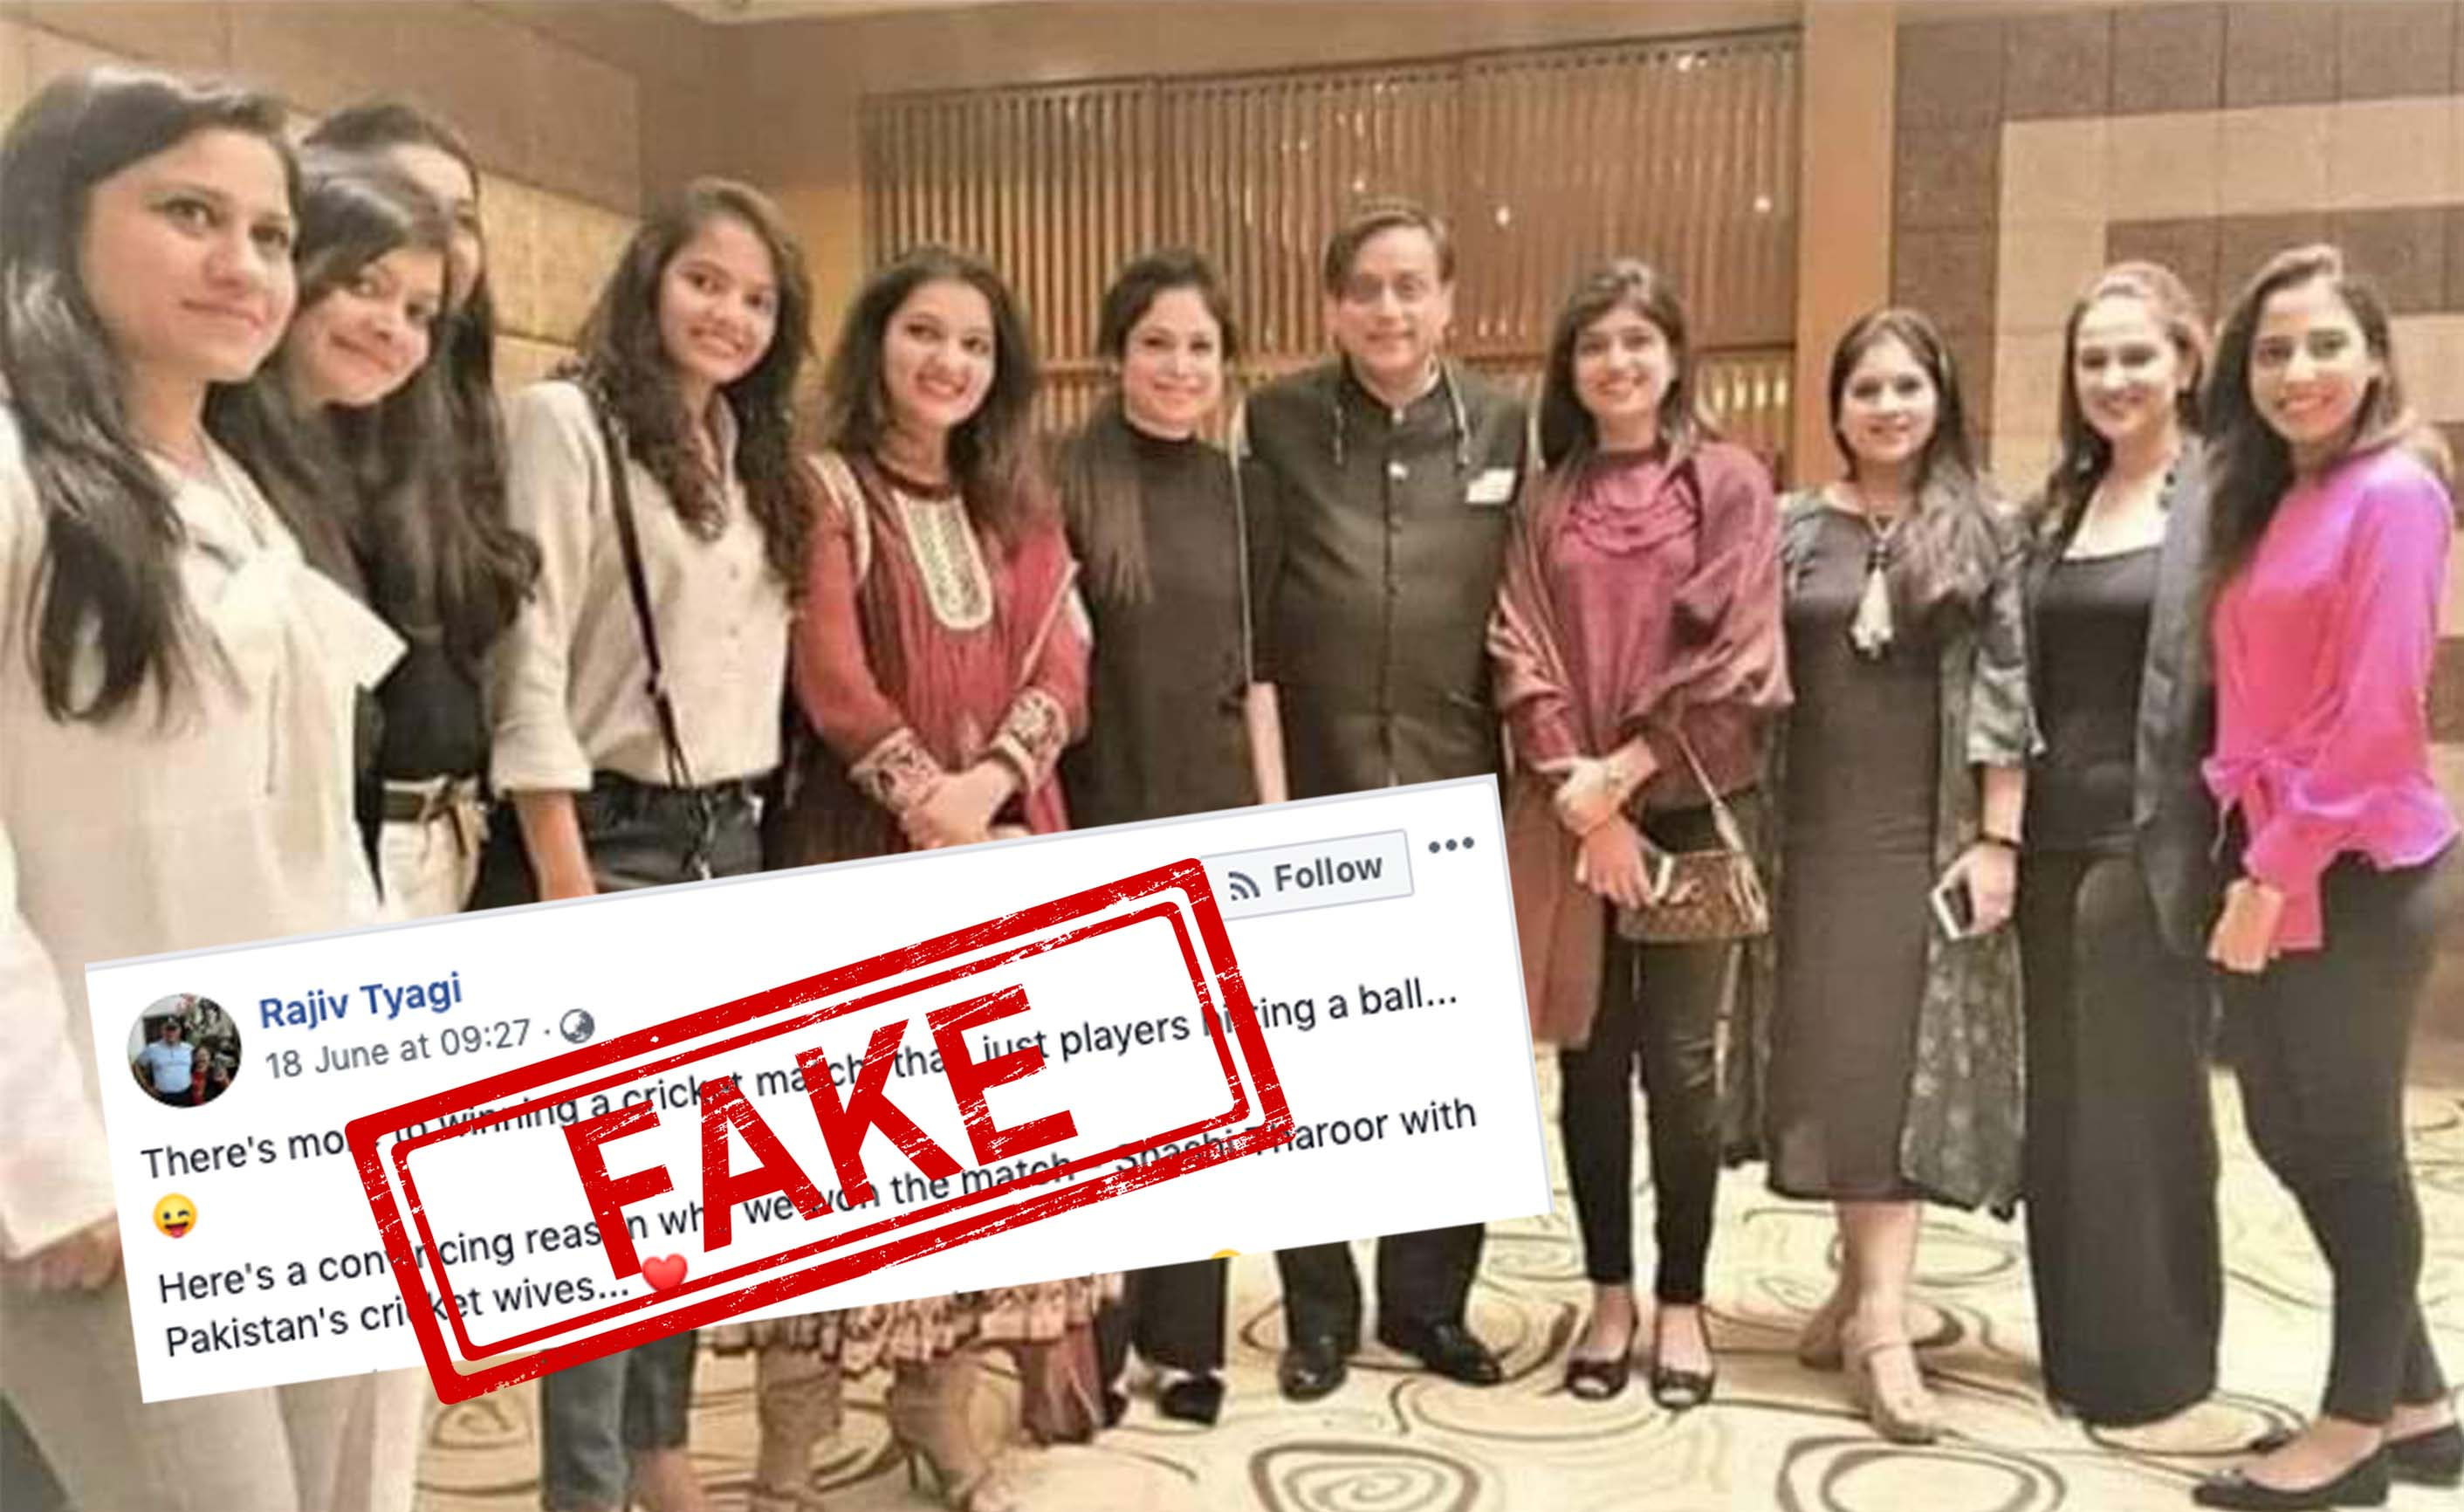 Shashi Tharoor, MP, Lok Sabha, Congress, Pakistani, Cricketers, Sports, ICC, Wives, NewsMobile, Mobile, News, India, Fact Checker, Fact Check, FAKE